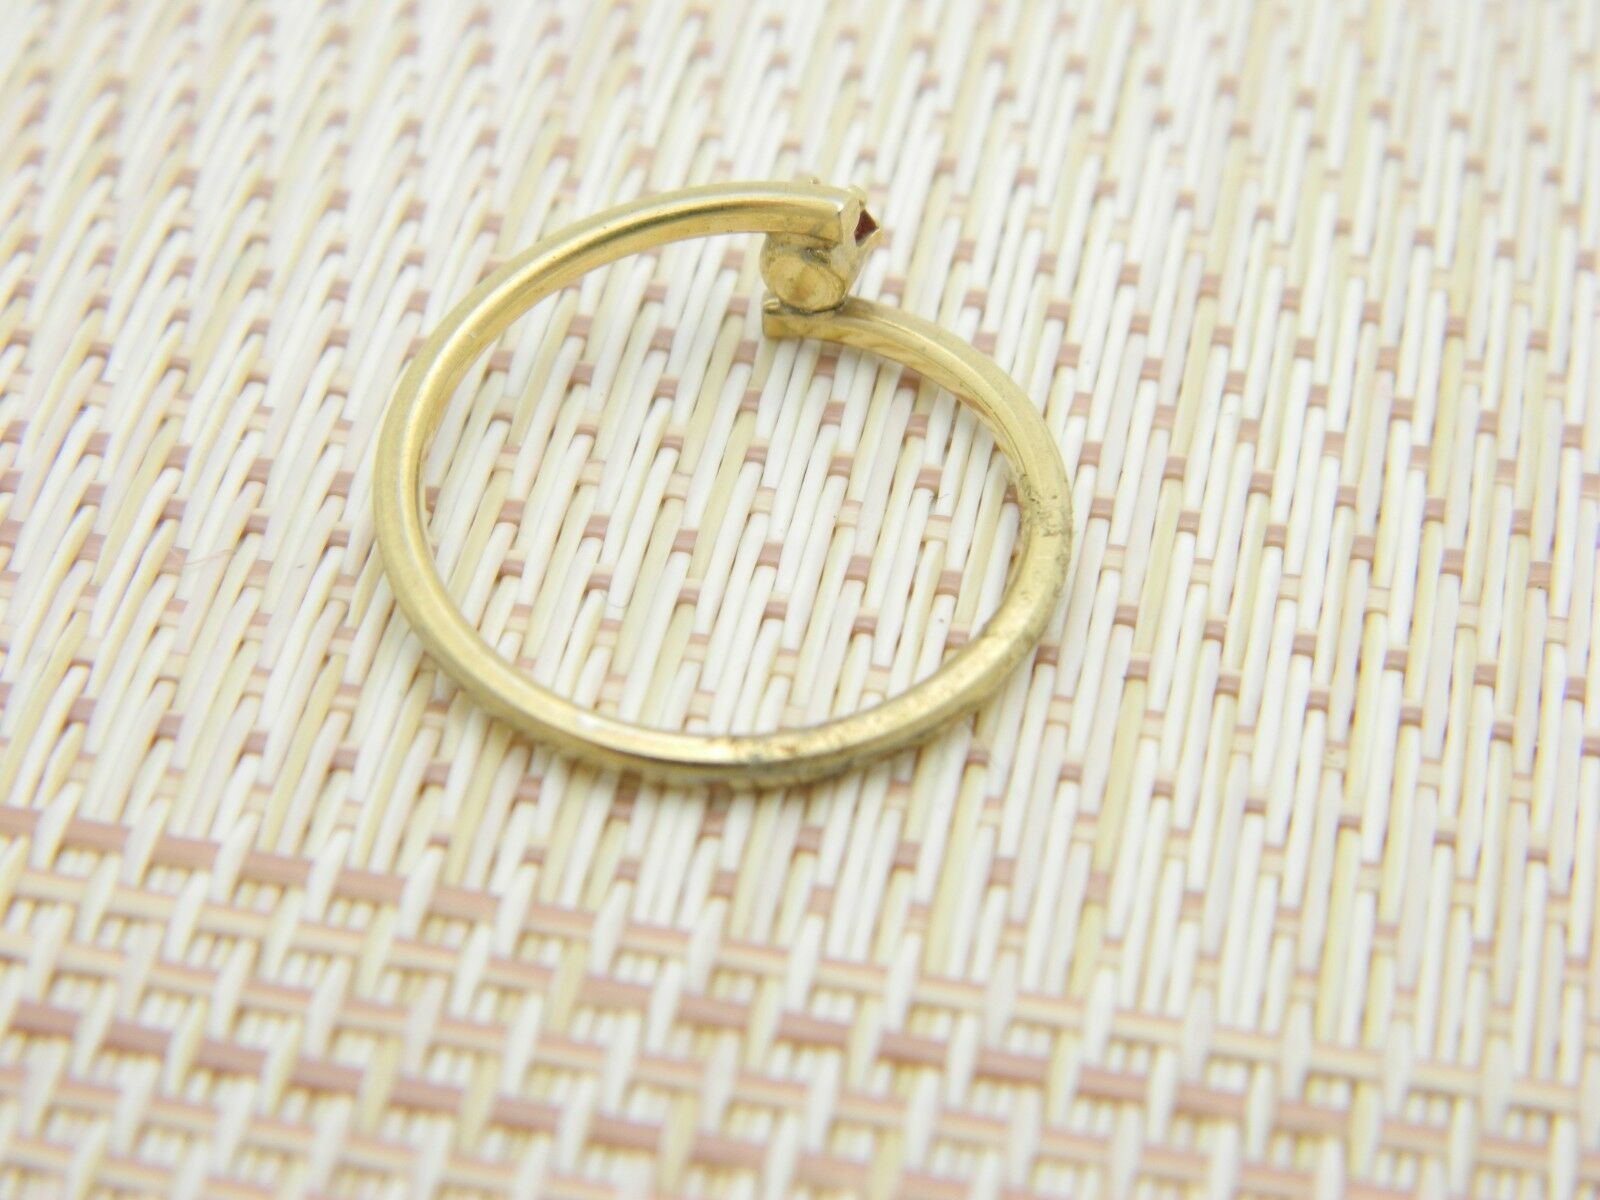 AVON Gold Tone Red Rhinestone Dainty Ring Adjustable Size 7.25 Vintage image 4